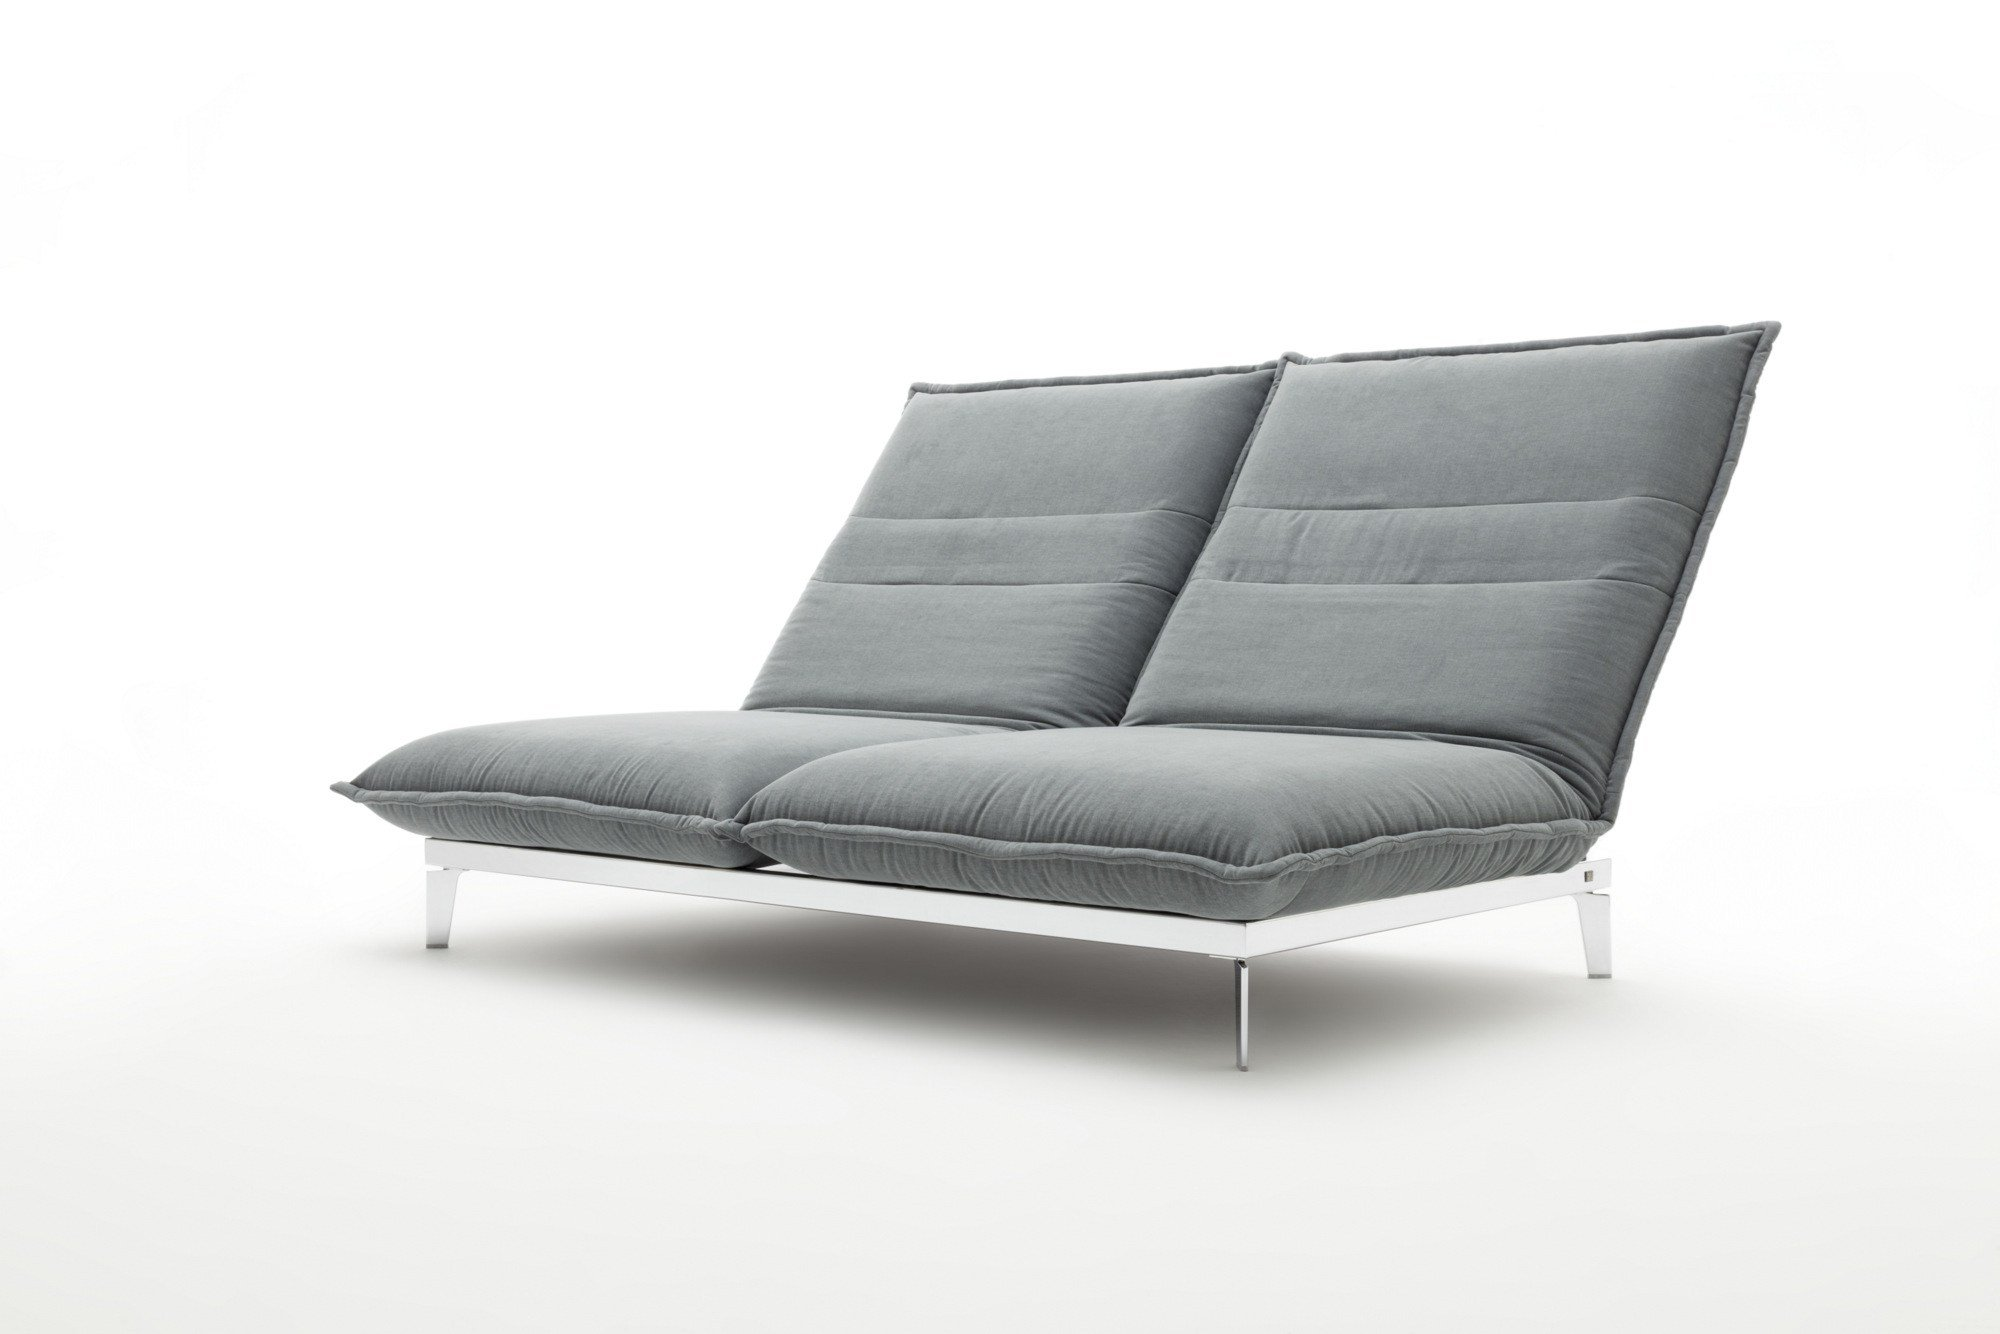 nova chaiselongue aus stoff by rolf benz design joachim nees. Black Bedroom Furniture Sets. Home Design Ideas